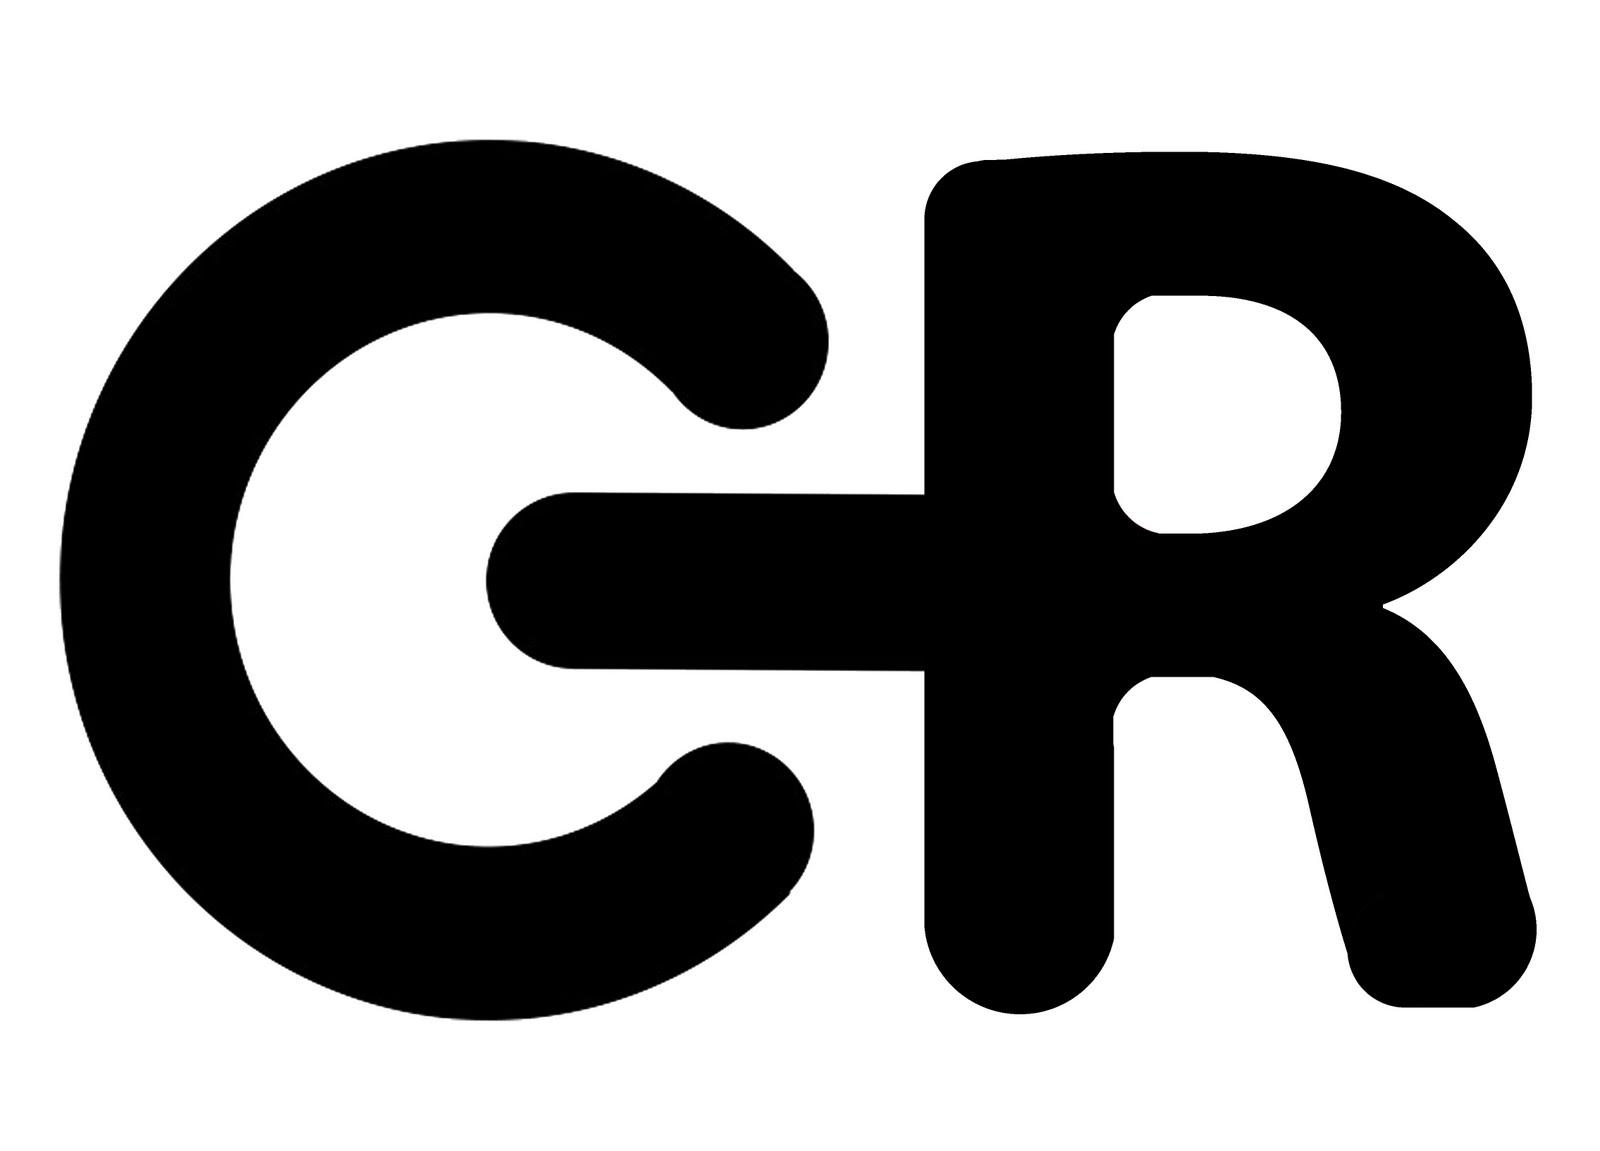 Logo g Ldn re l... G R Logo